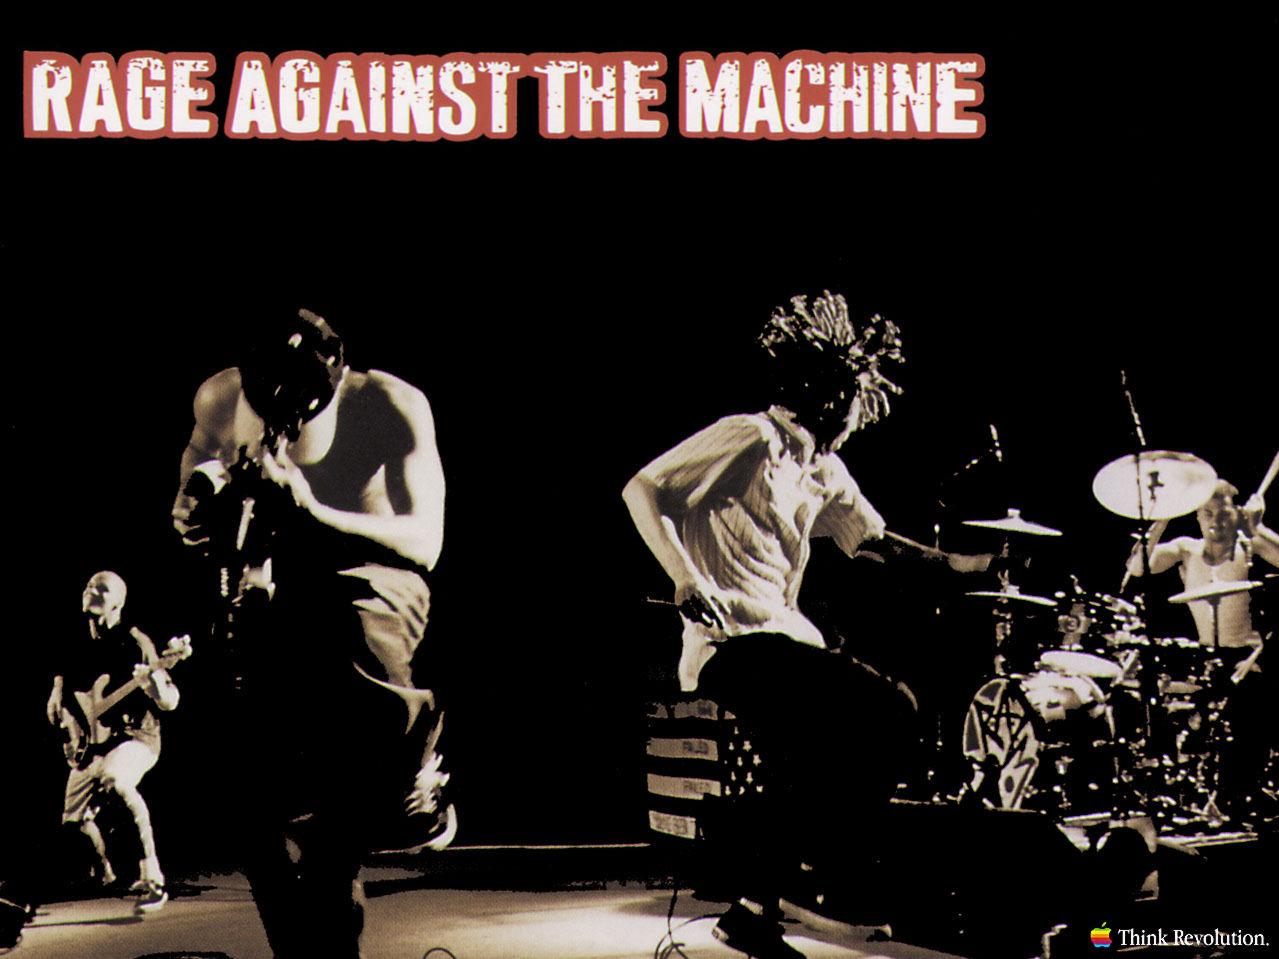 Against Rage S Tom 90 Morello Machine